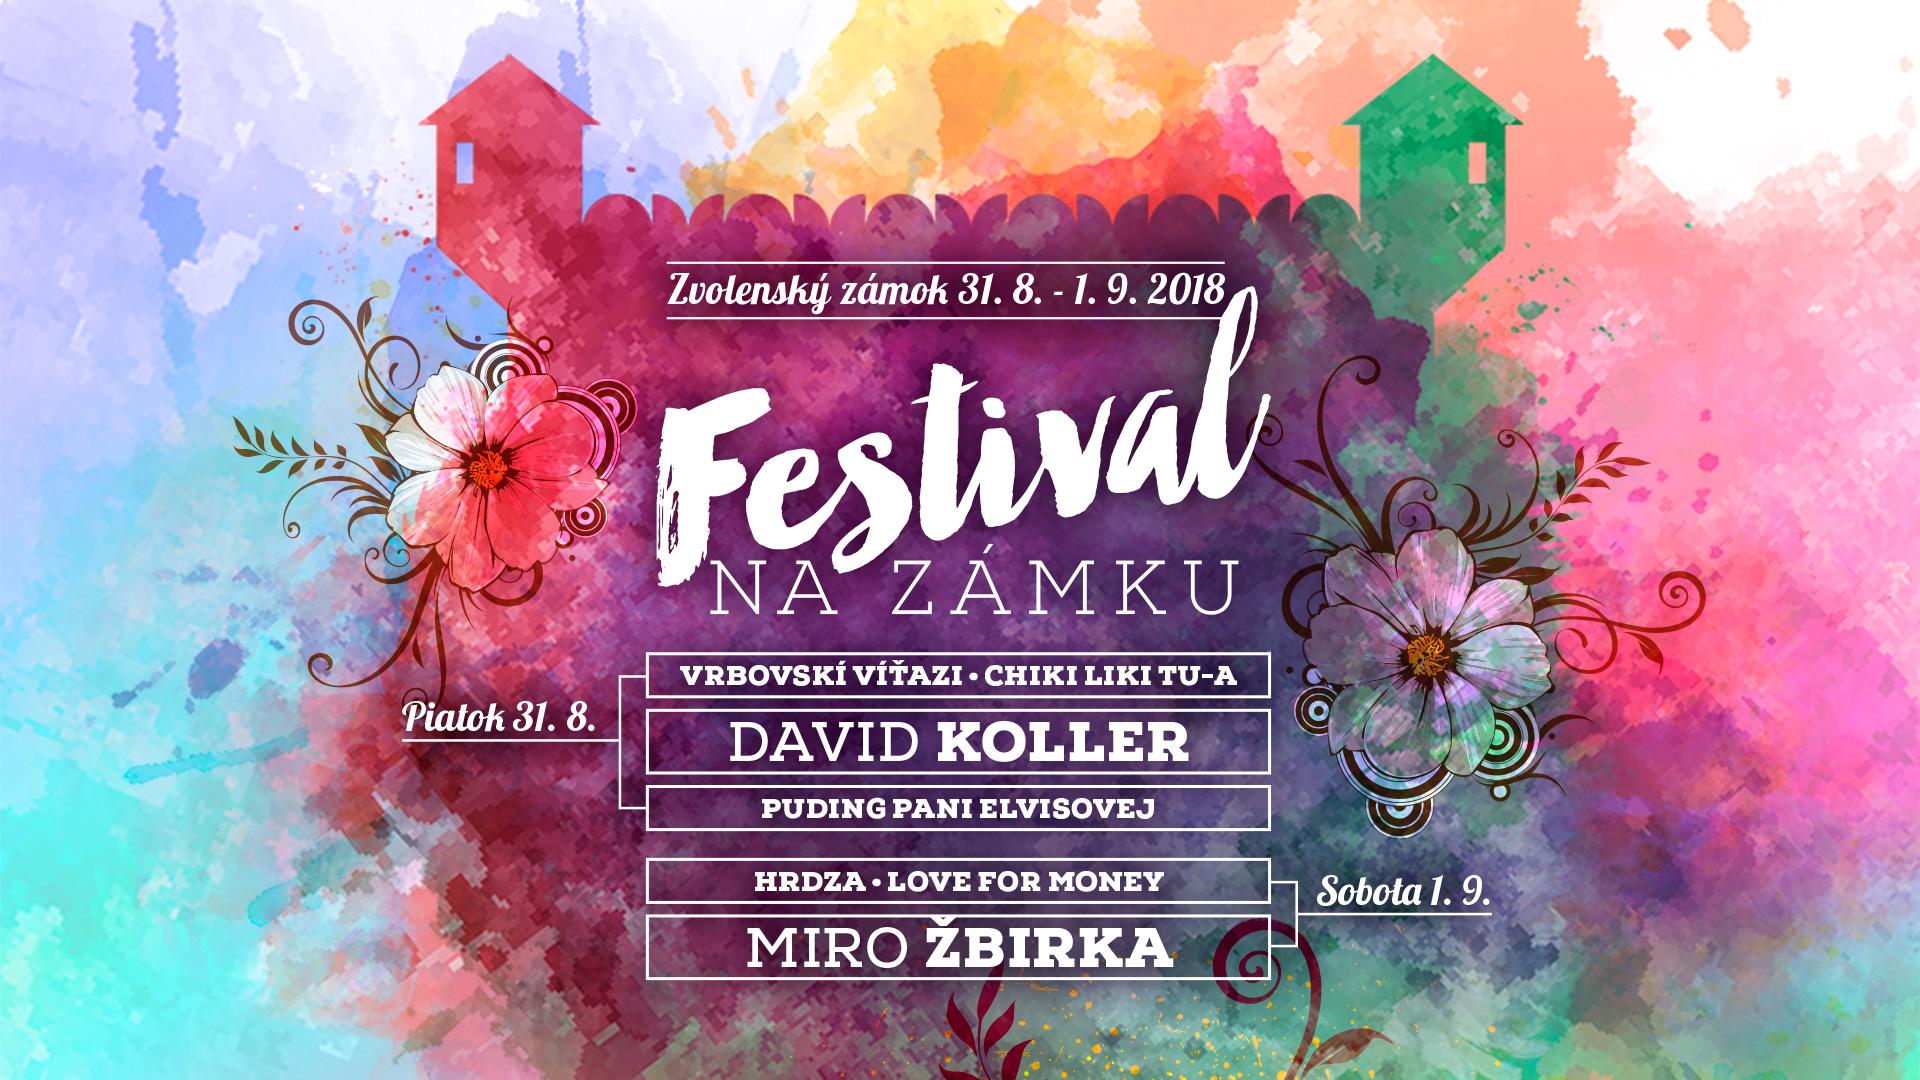 Festival-na-zamku-FB-event.jpg